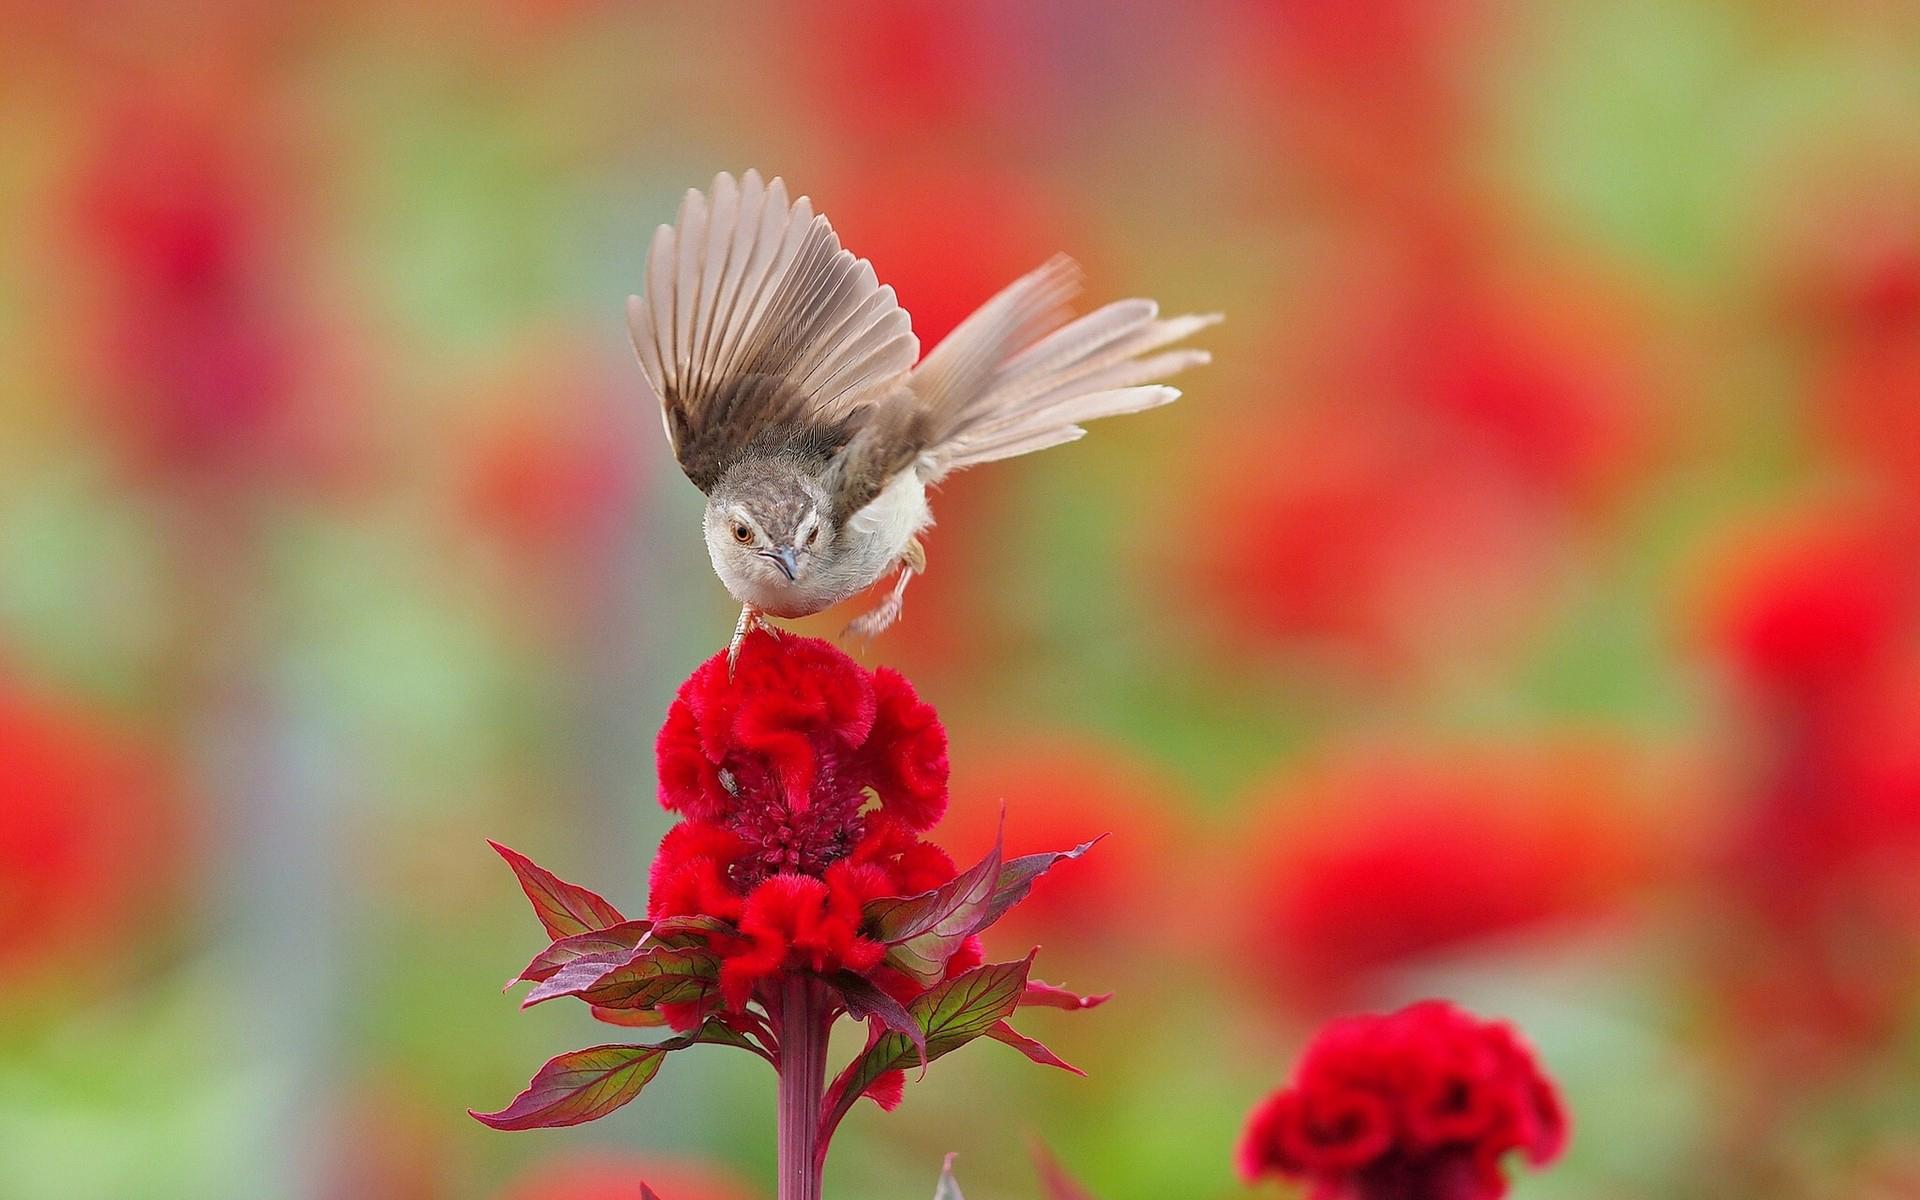 Oiseau Fond D Ecran Fond D Ecran Hd